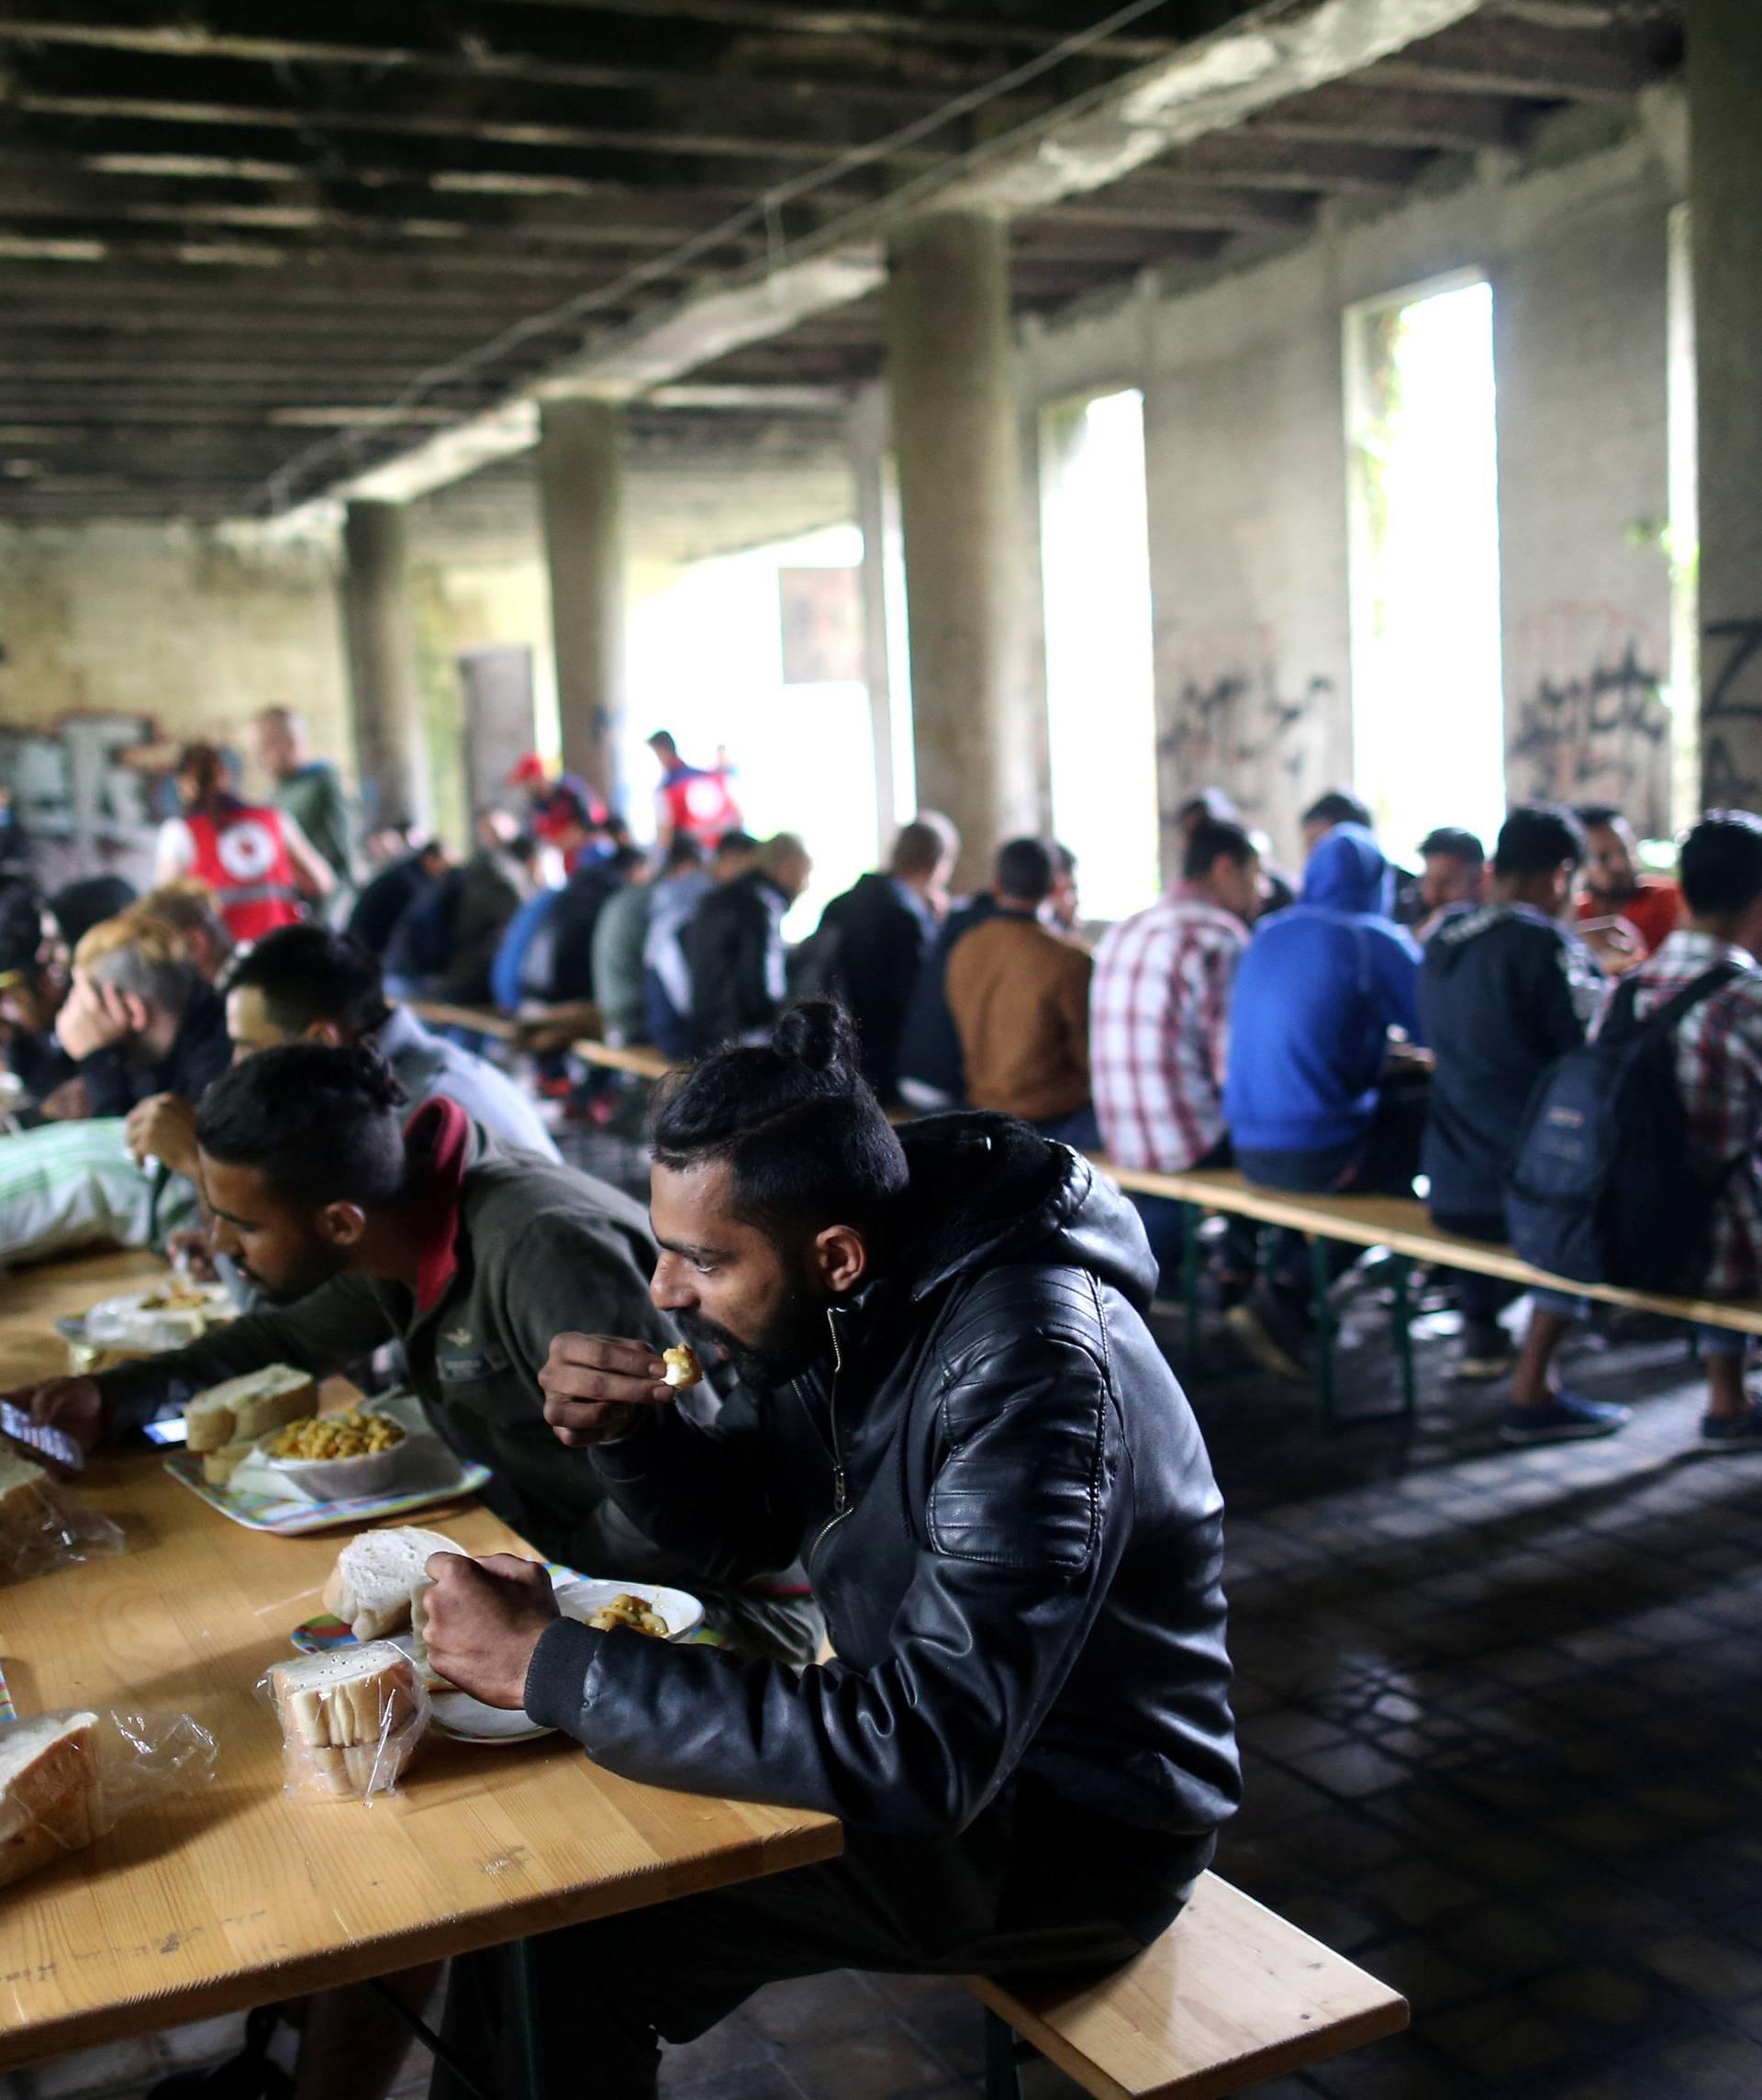 Migrants eat in a dorm destroyed during the Bosnian 1992-1995 war, in Bihac